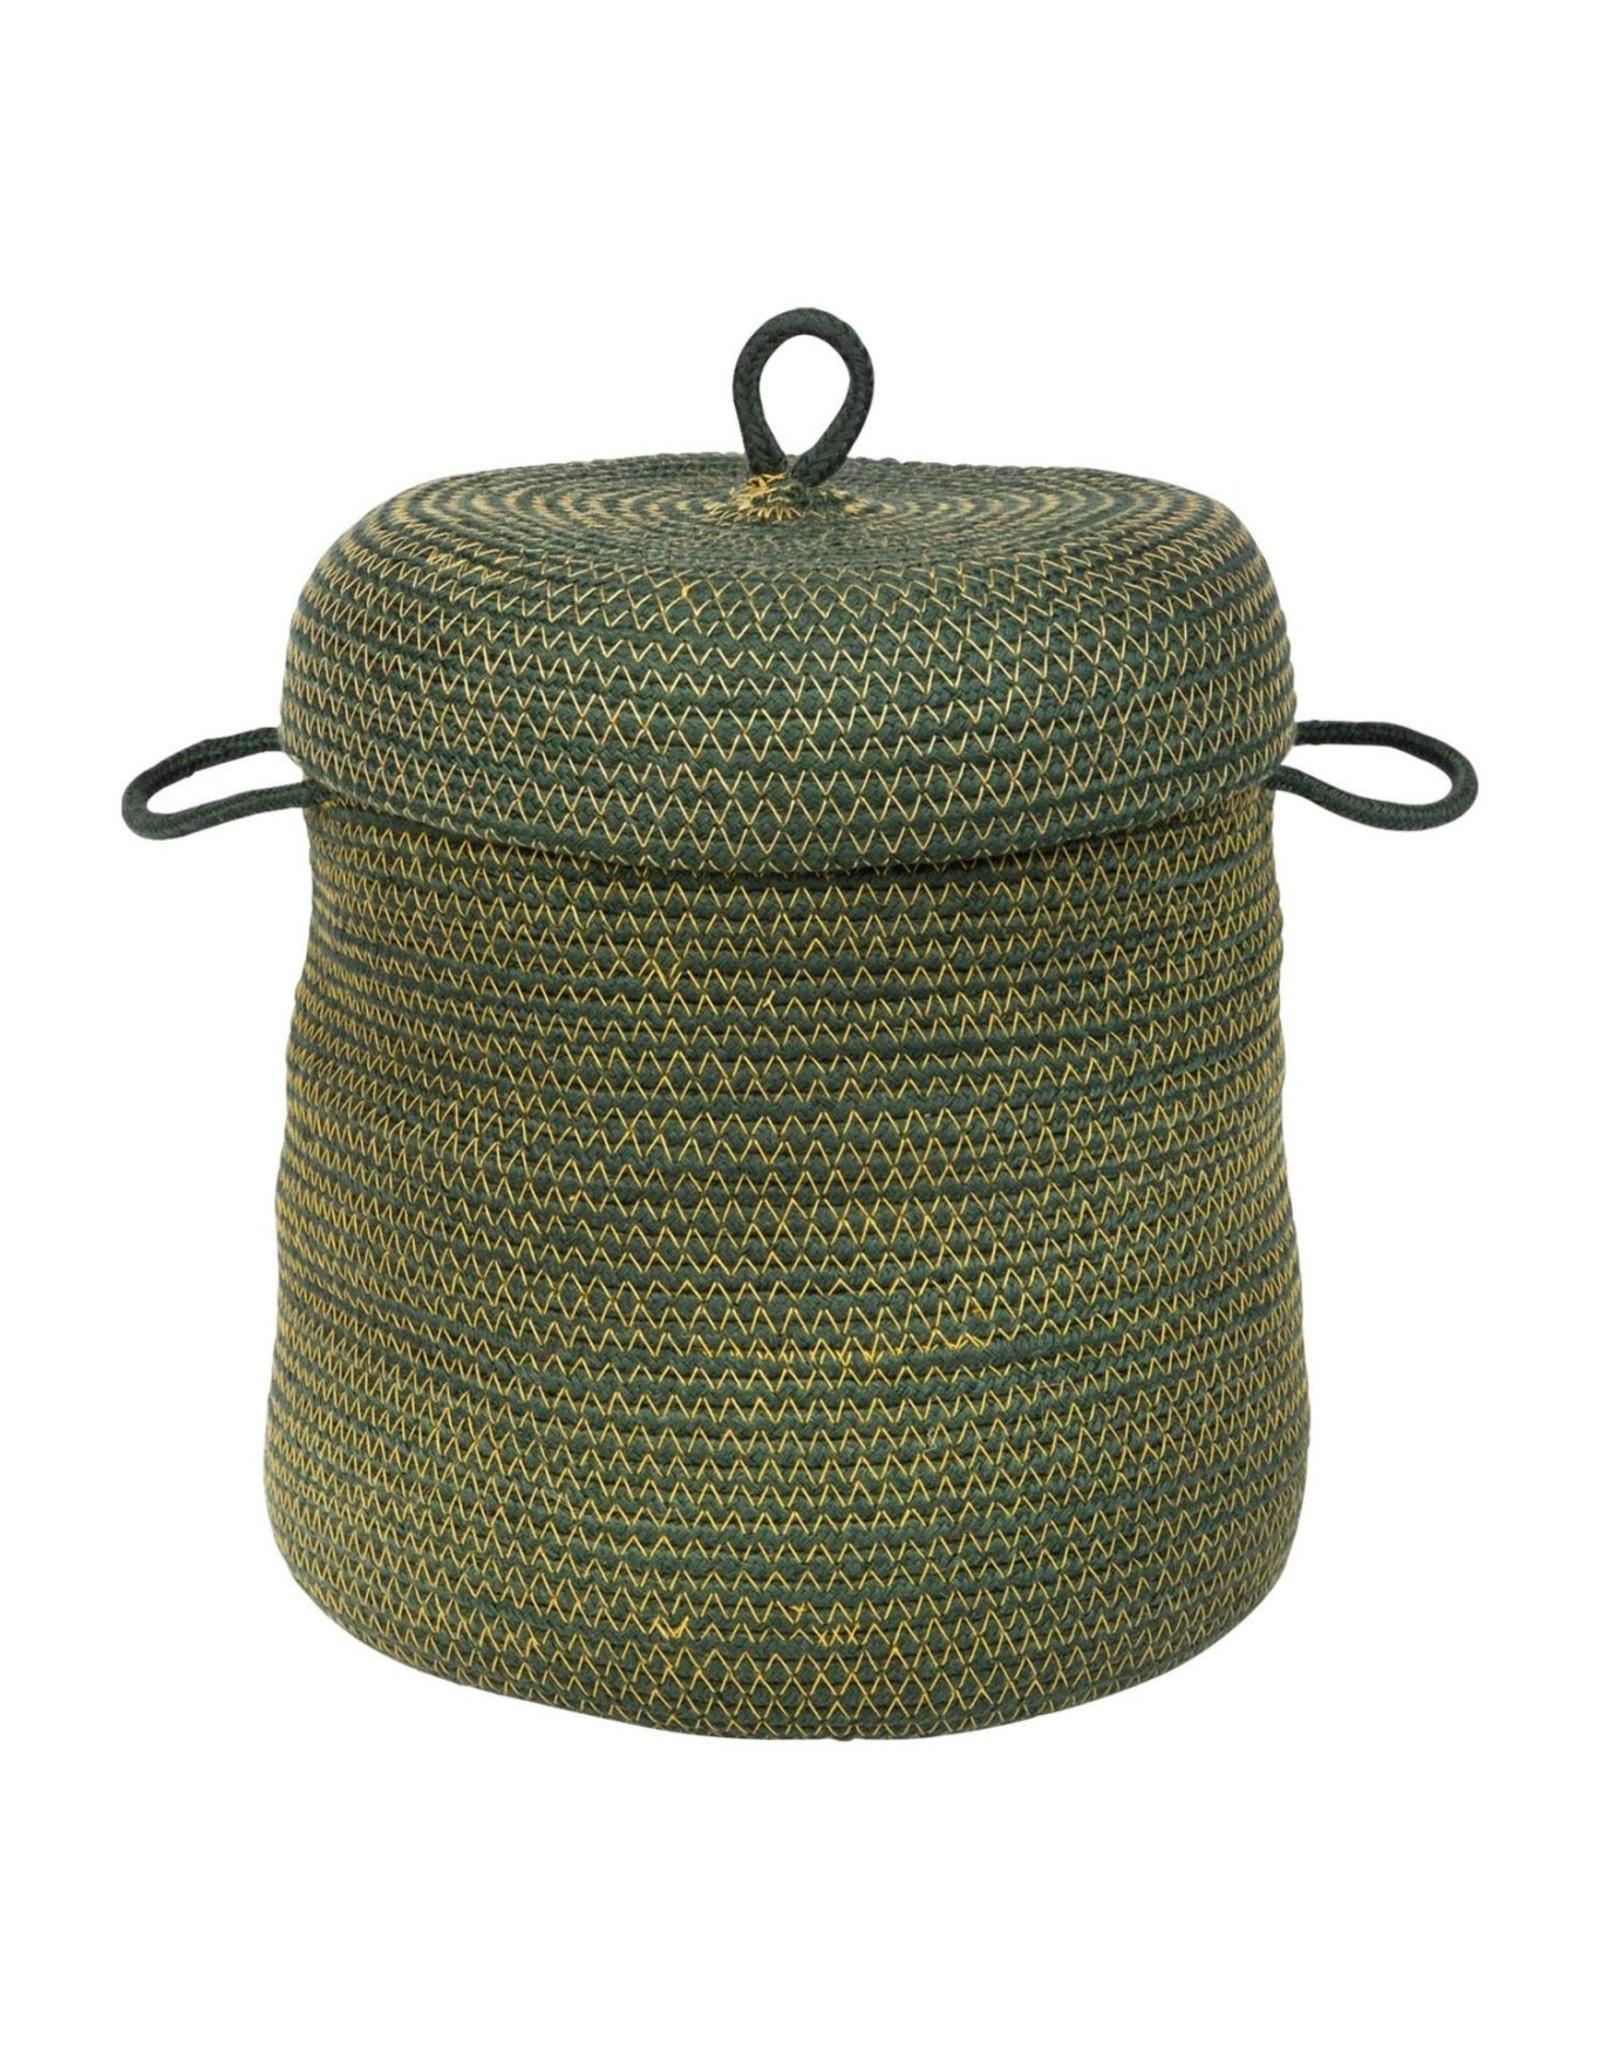 Bangladesh, Simplicity Basket